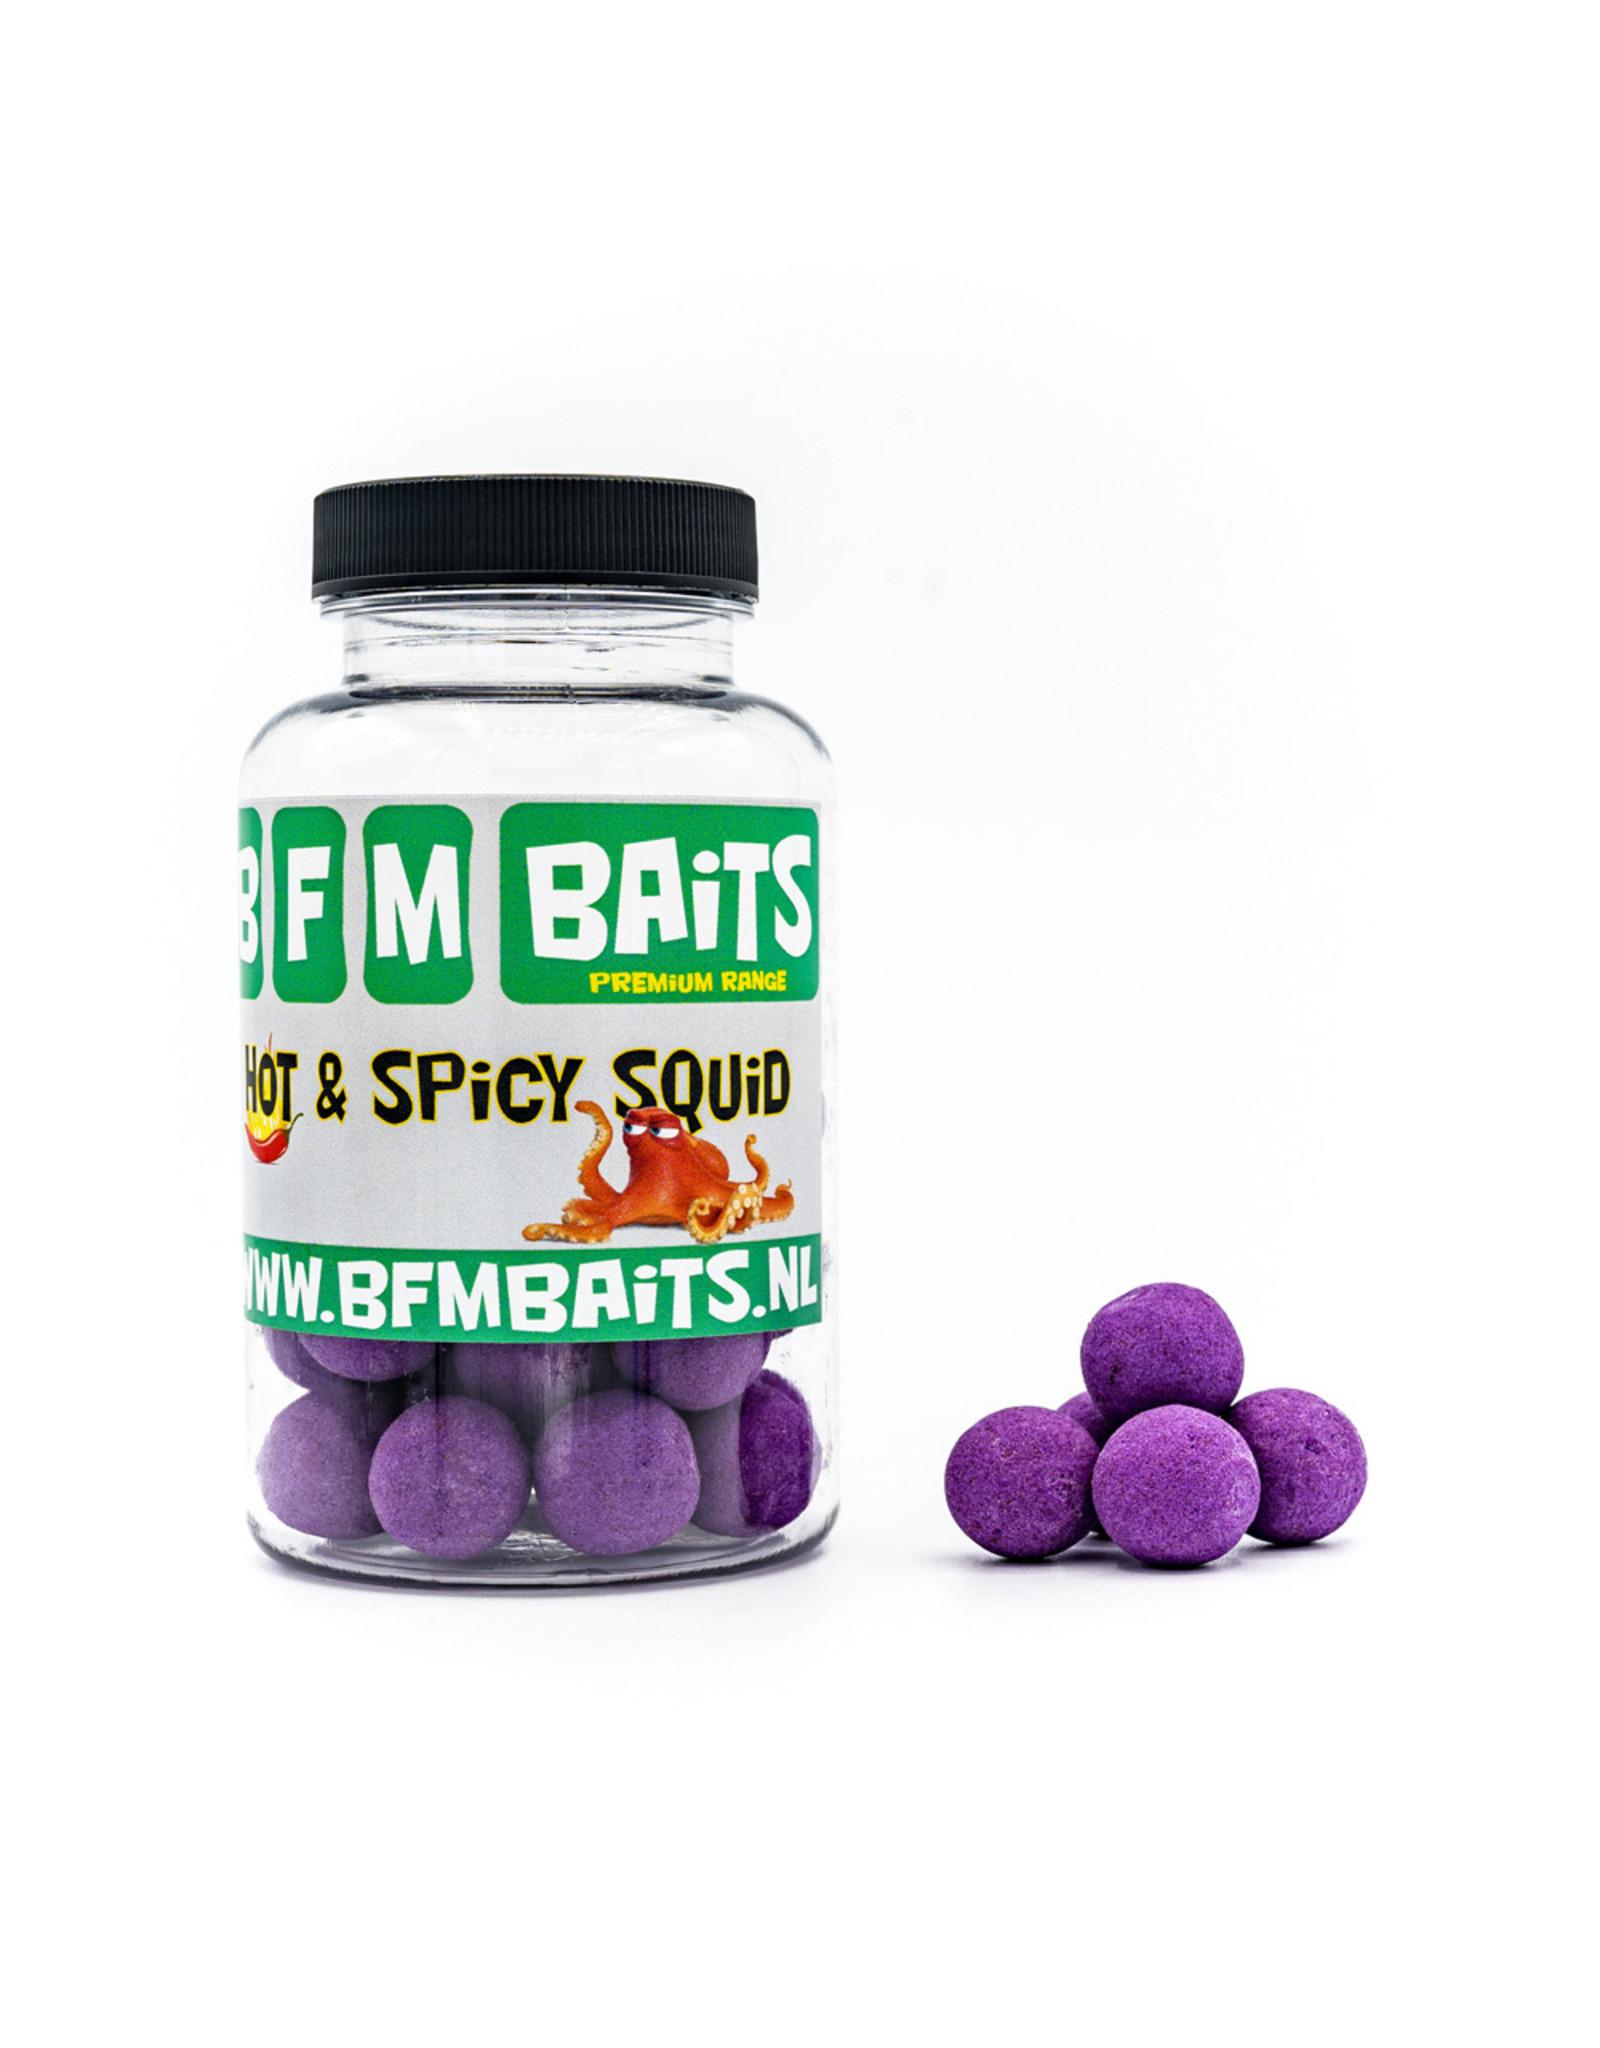 BFM Baits Hot & Spicy Squid– Pop-Ups 15mm